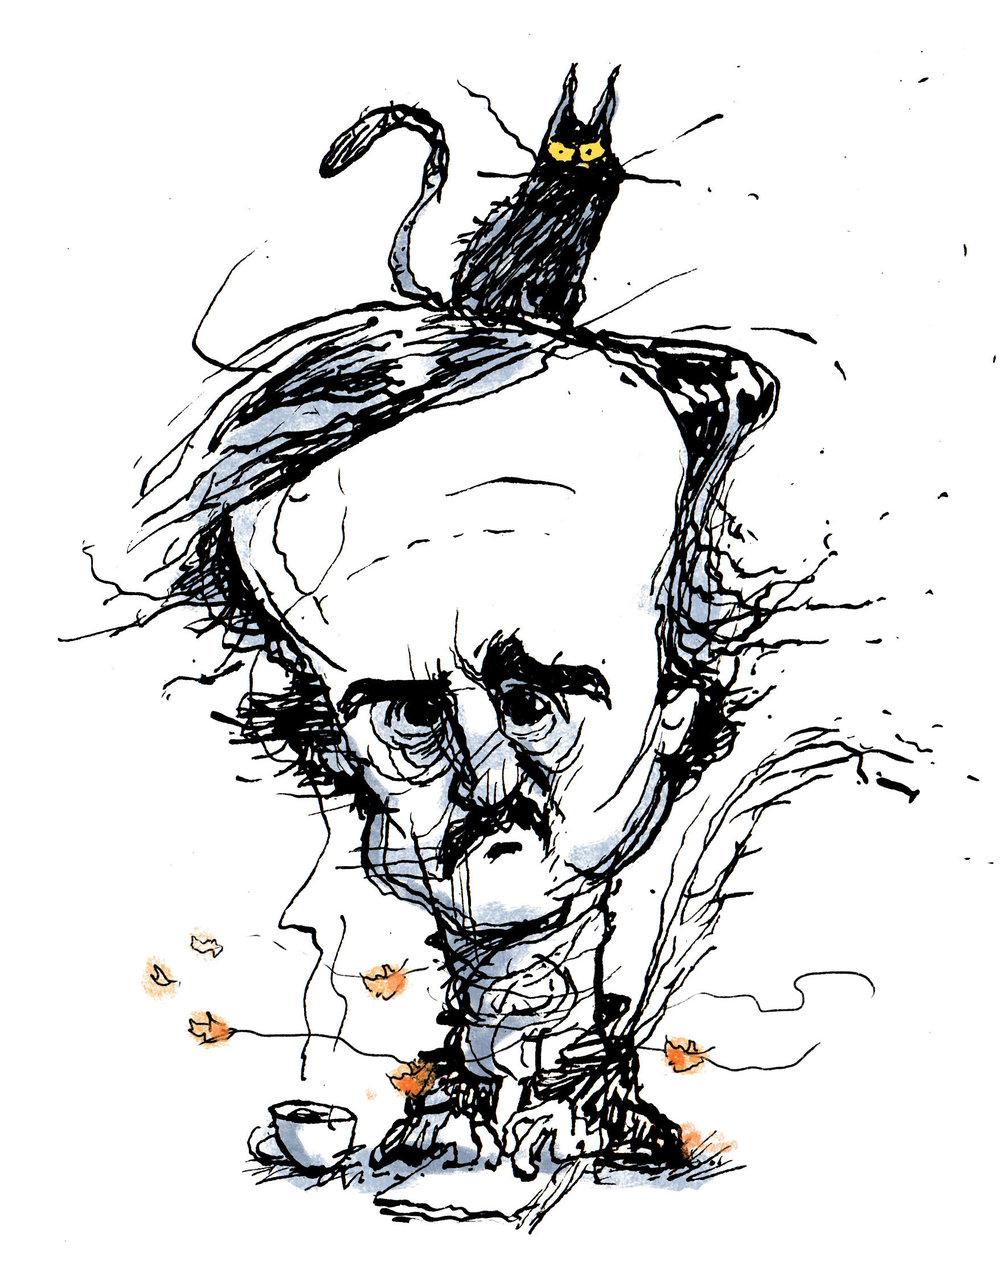 Poe 3(nosig).jpg